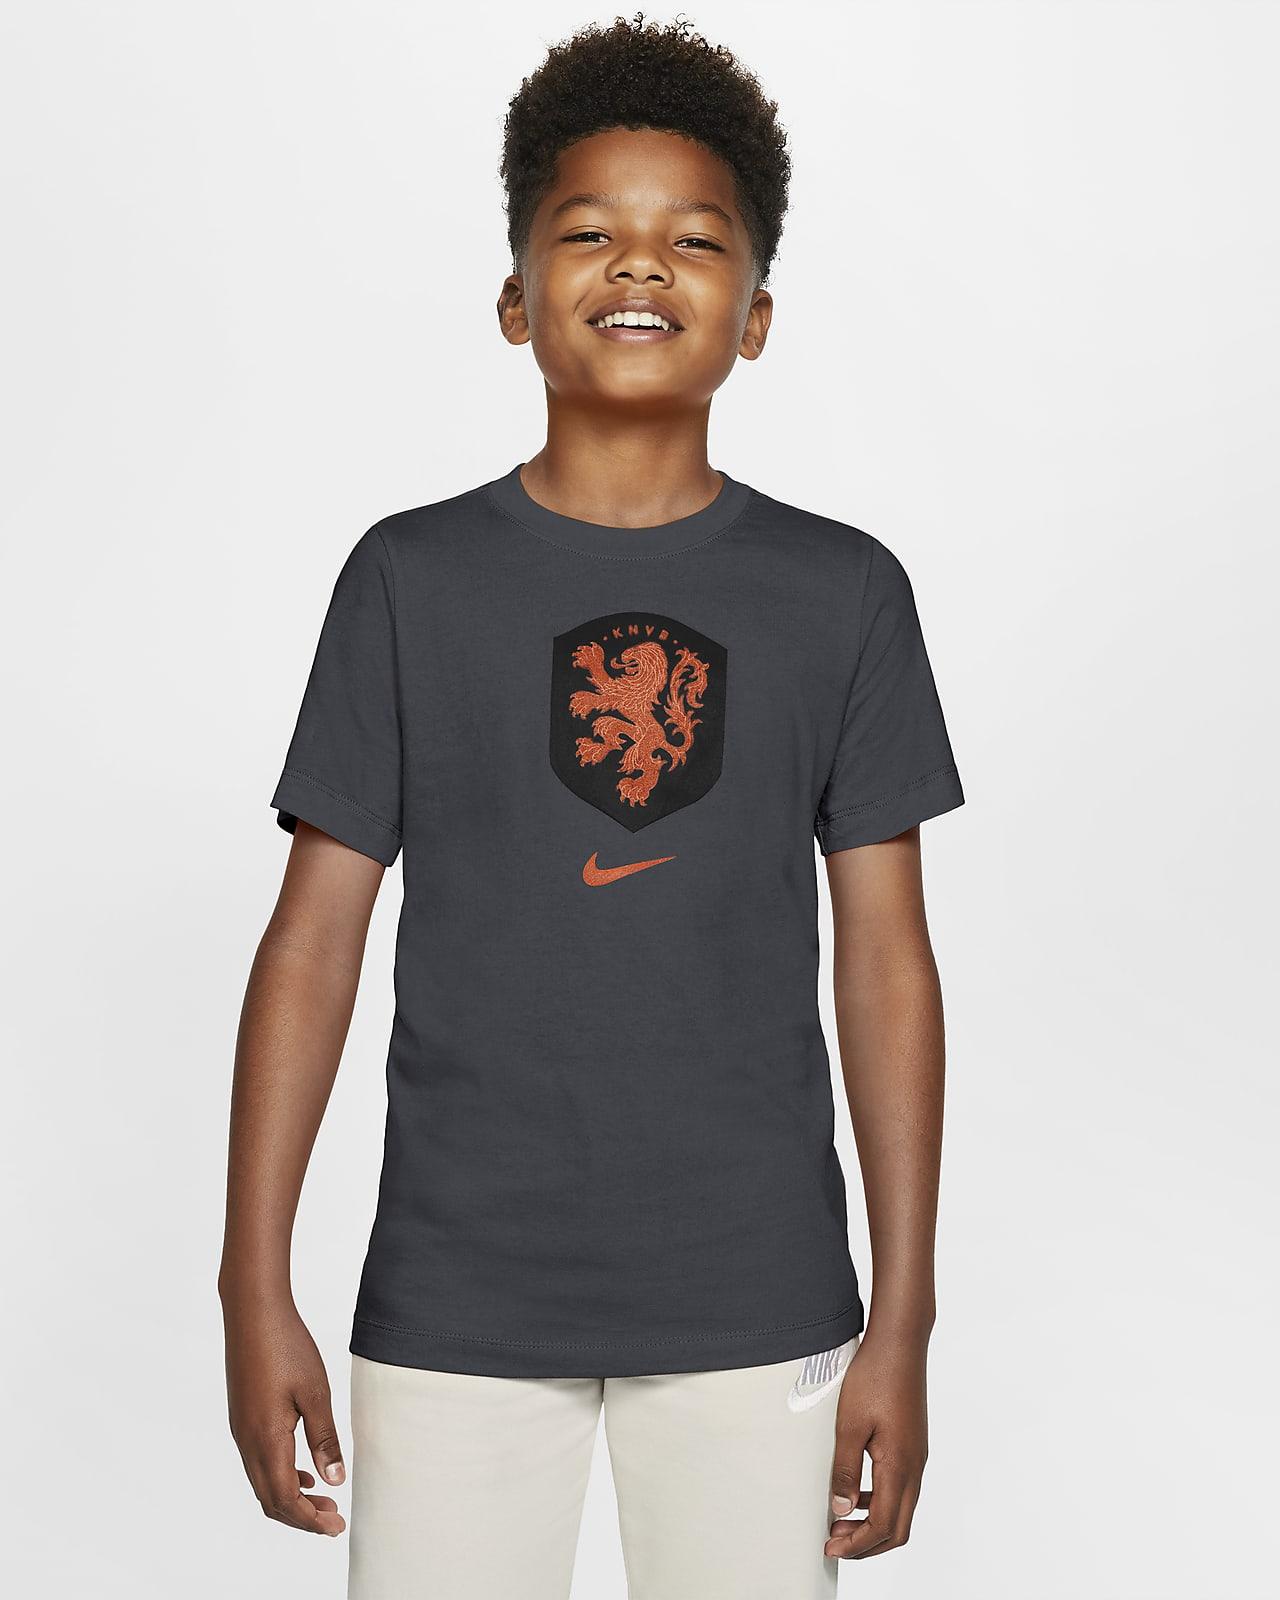 Hollanda Genç Çocuk Futbol Tişörtü